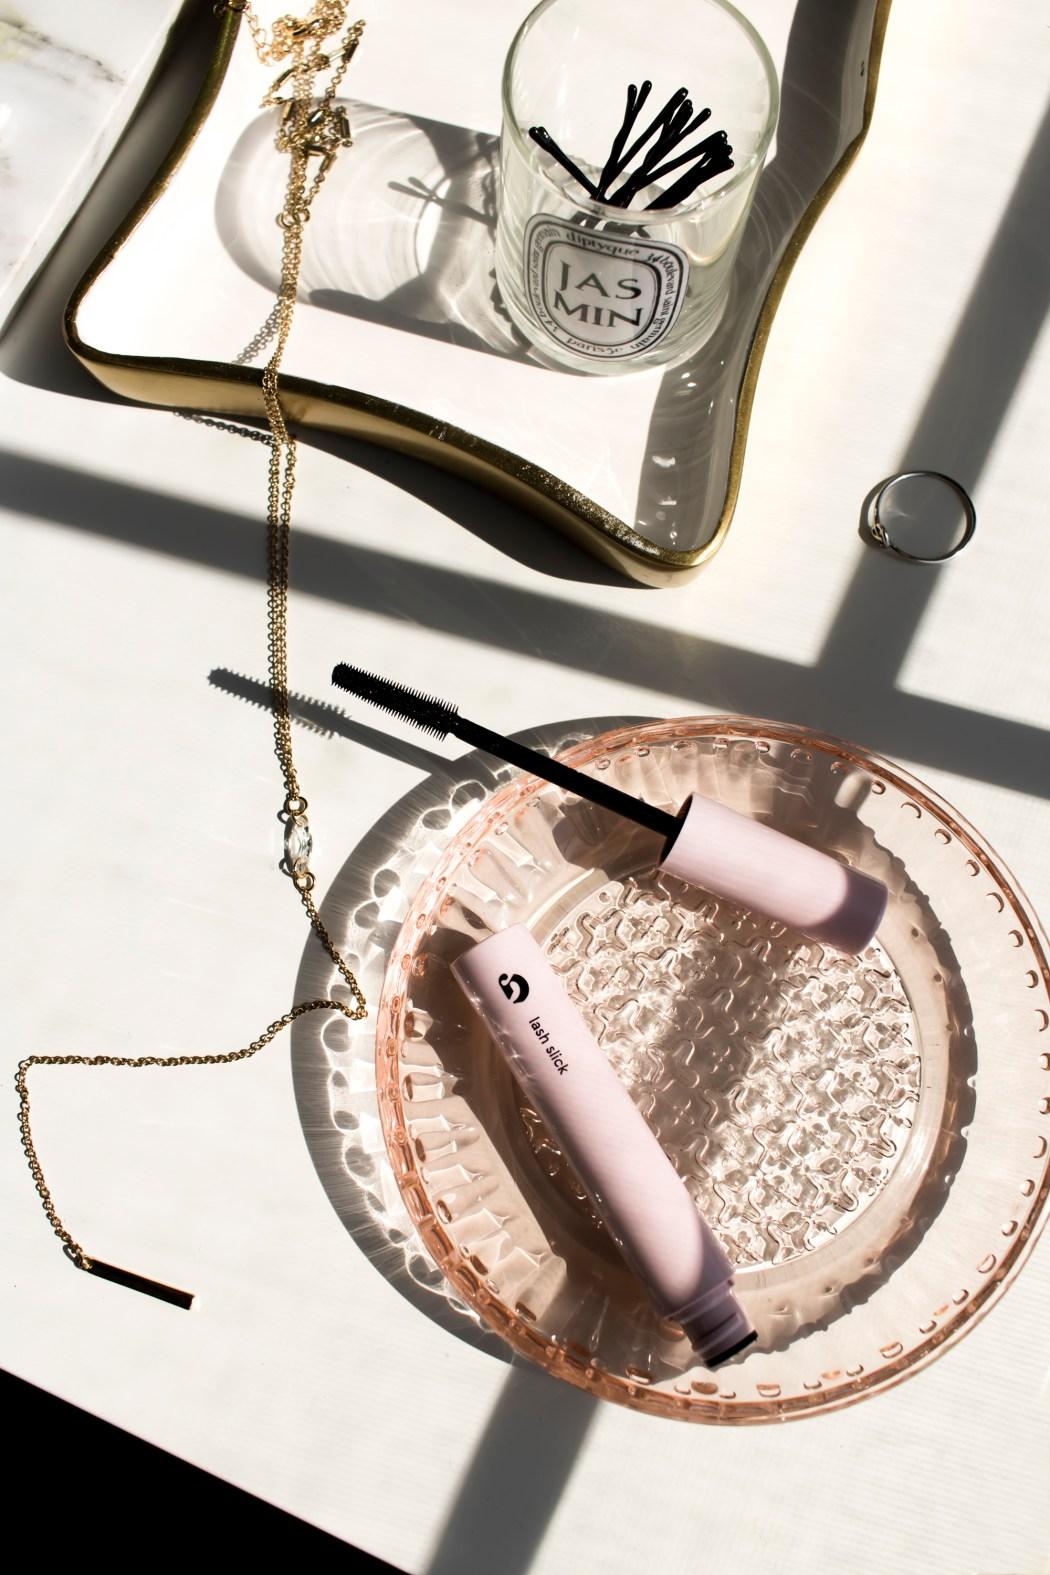 The new Glossier mascara-- Lash Slick review